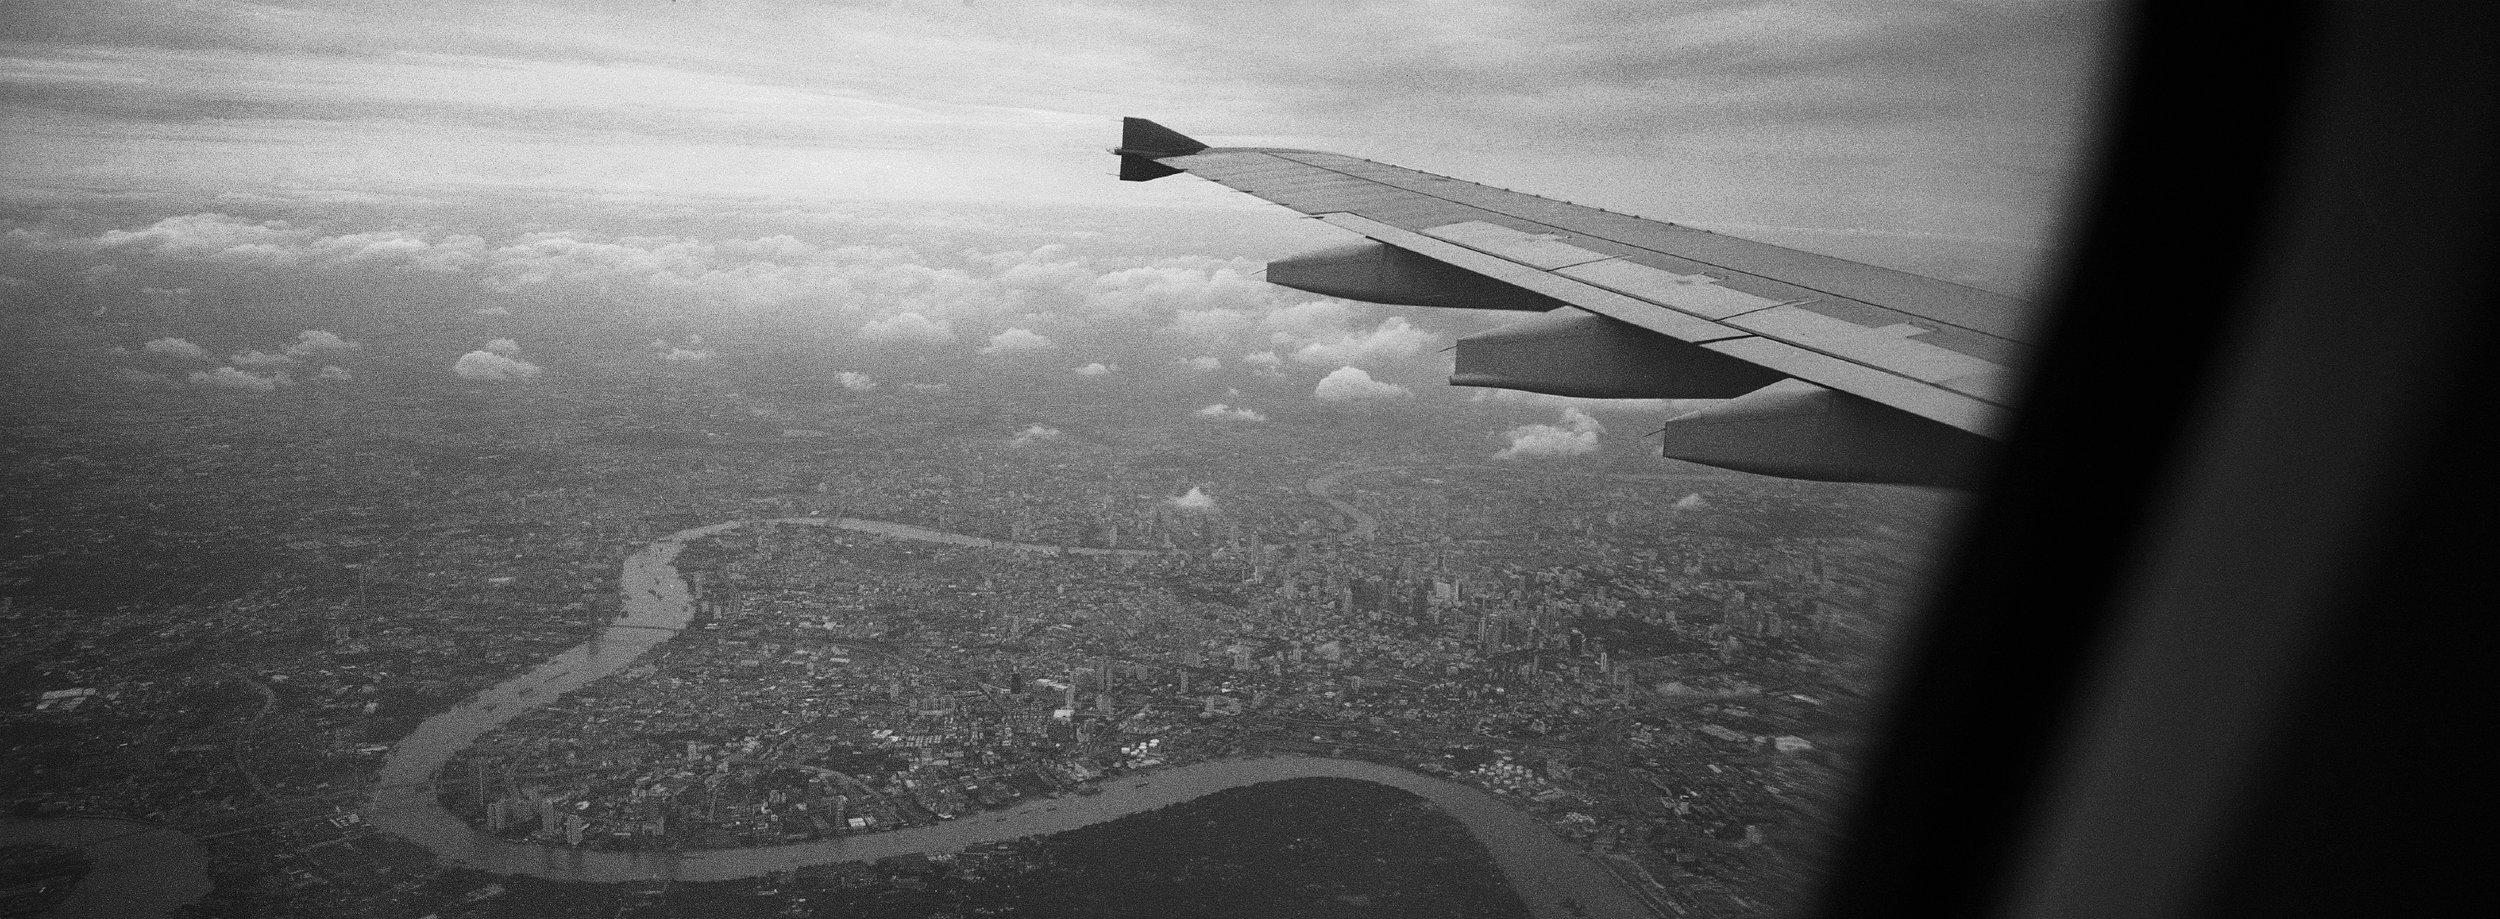 Arriving in Bangkok, Thailand. 2011